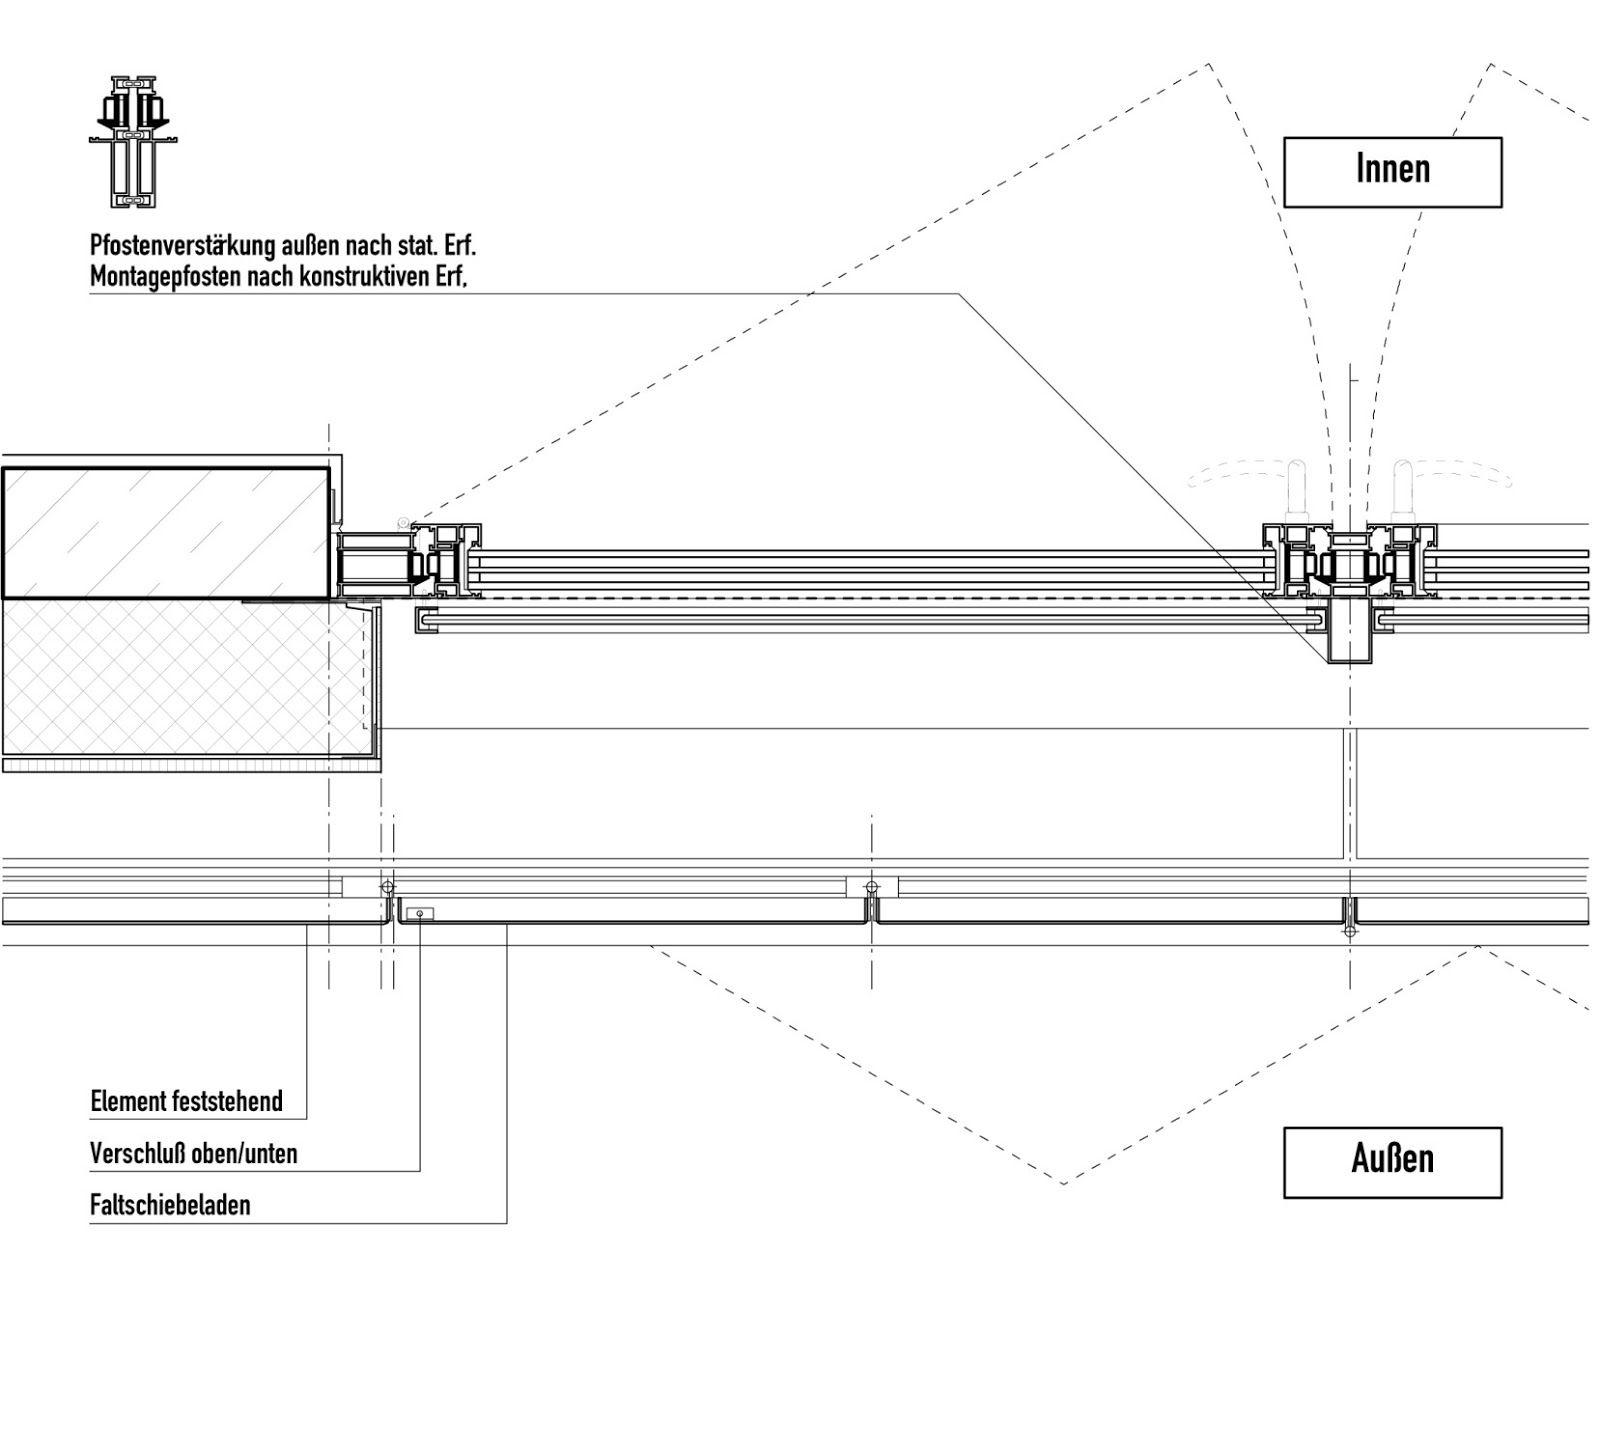 Fenster detail grundriss  a f a s i a: Grüntuch Ernst Architekten | Arch. < Details ...